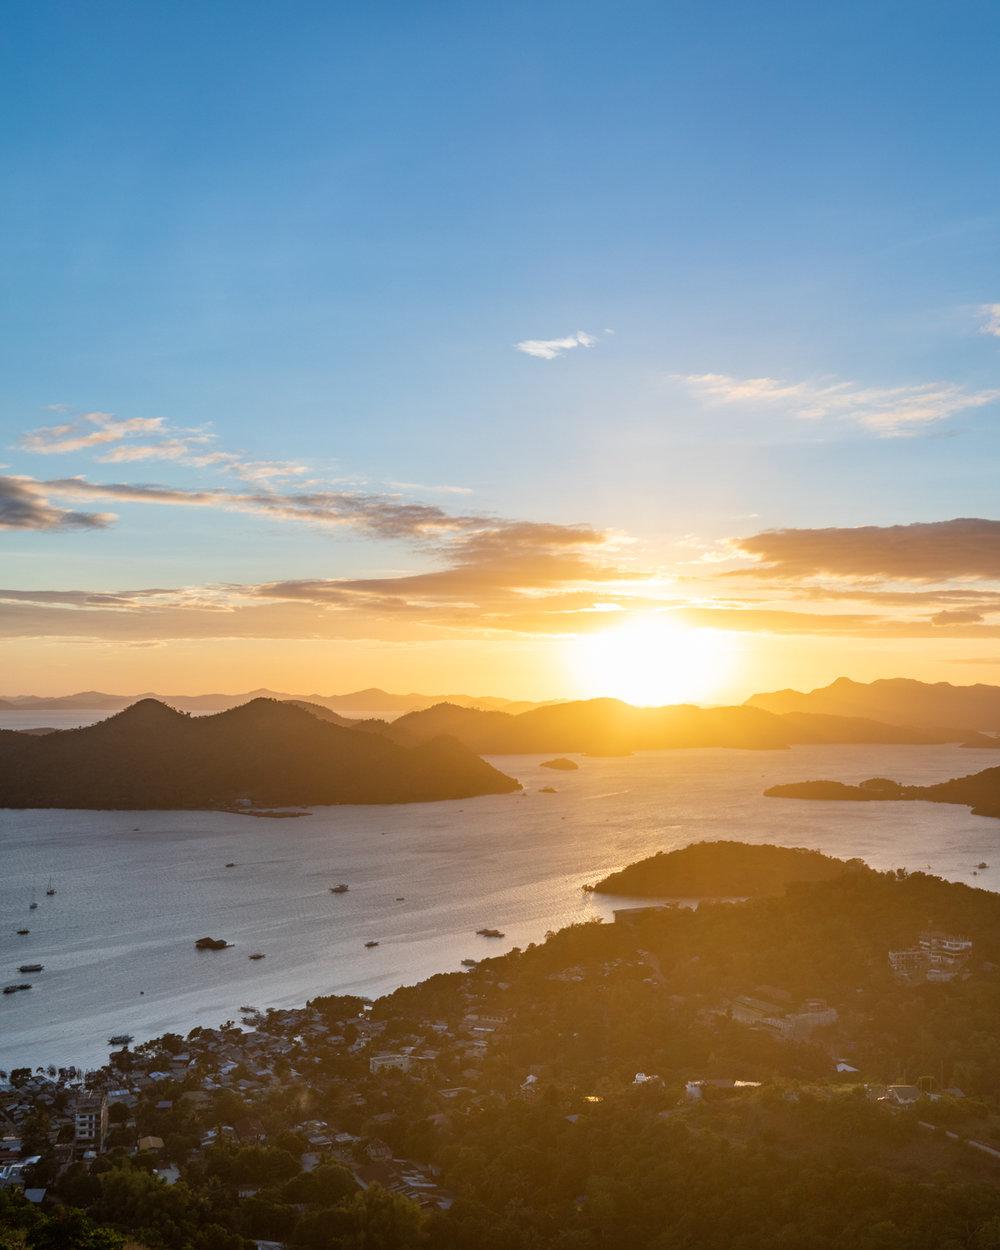 Mount Tapyas Sunset - Phillipines Itinerary Coron